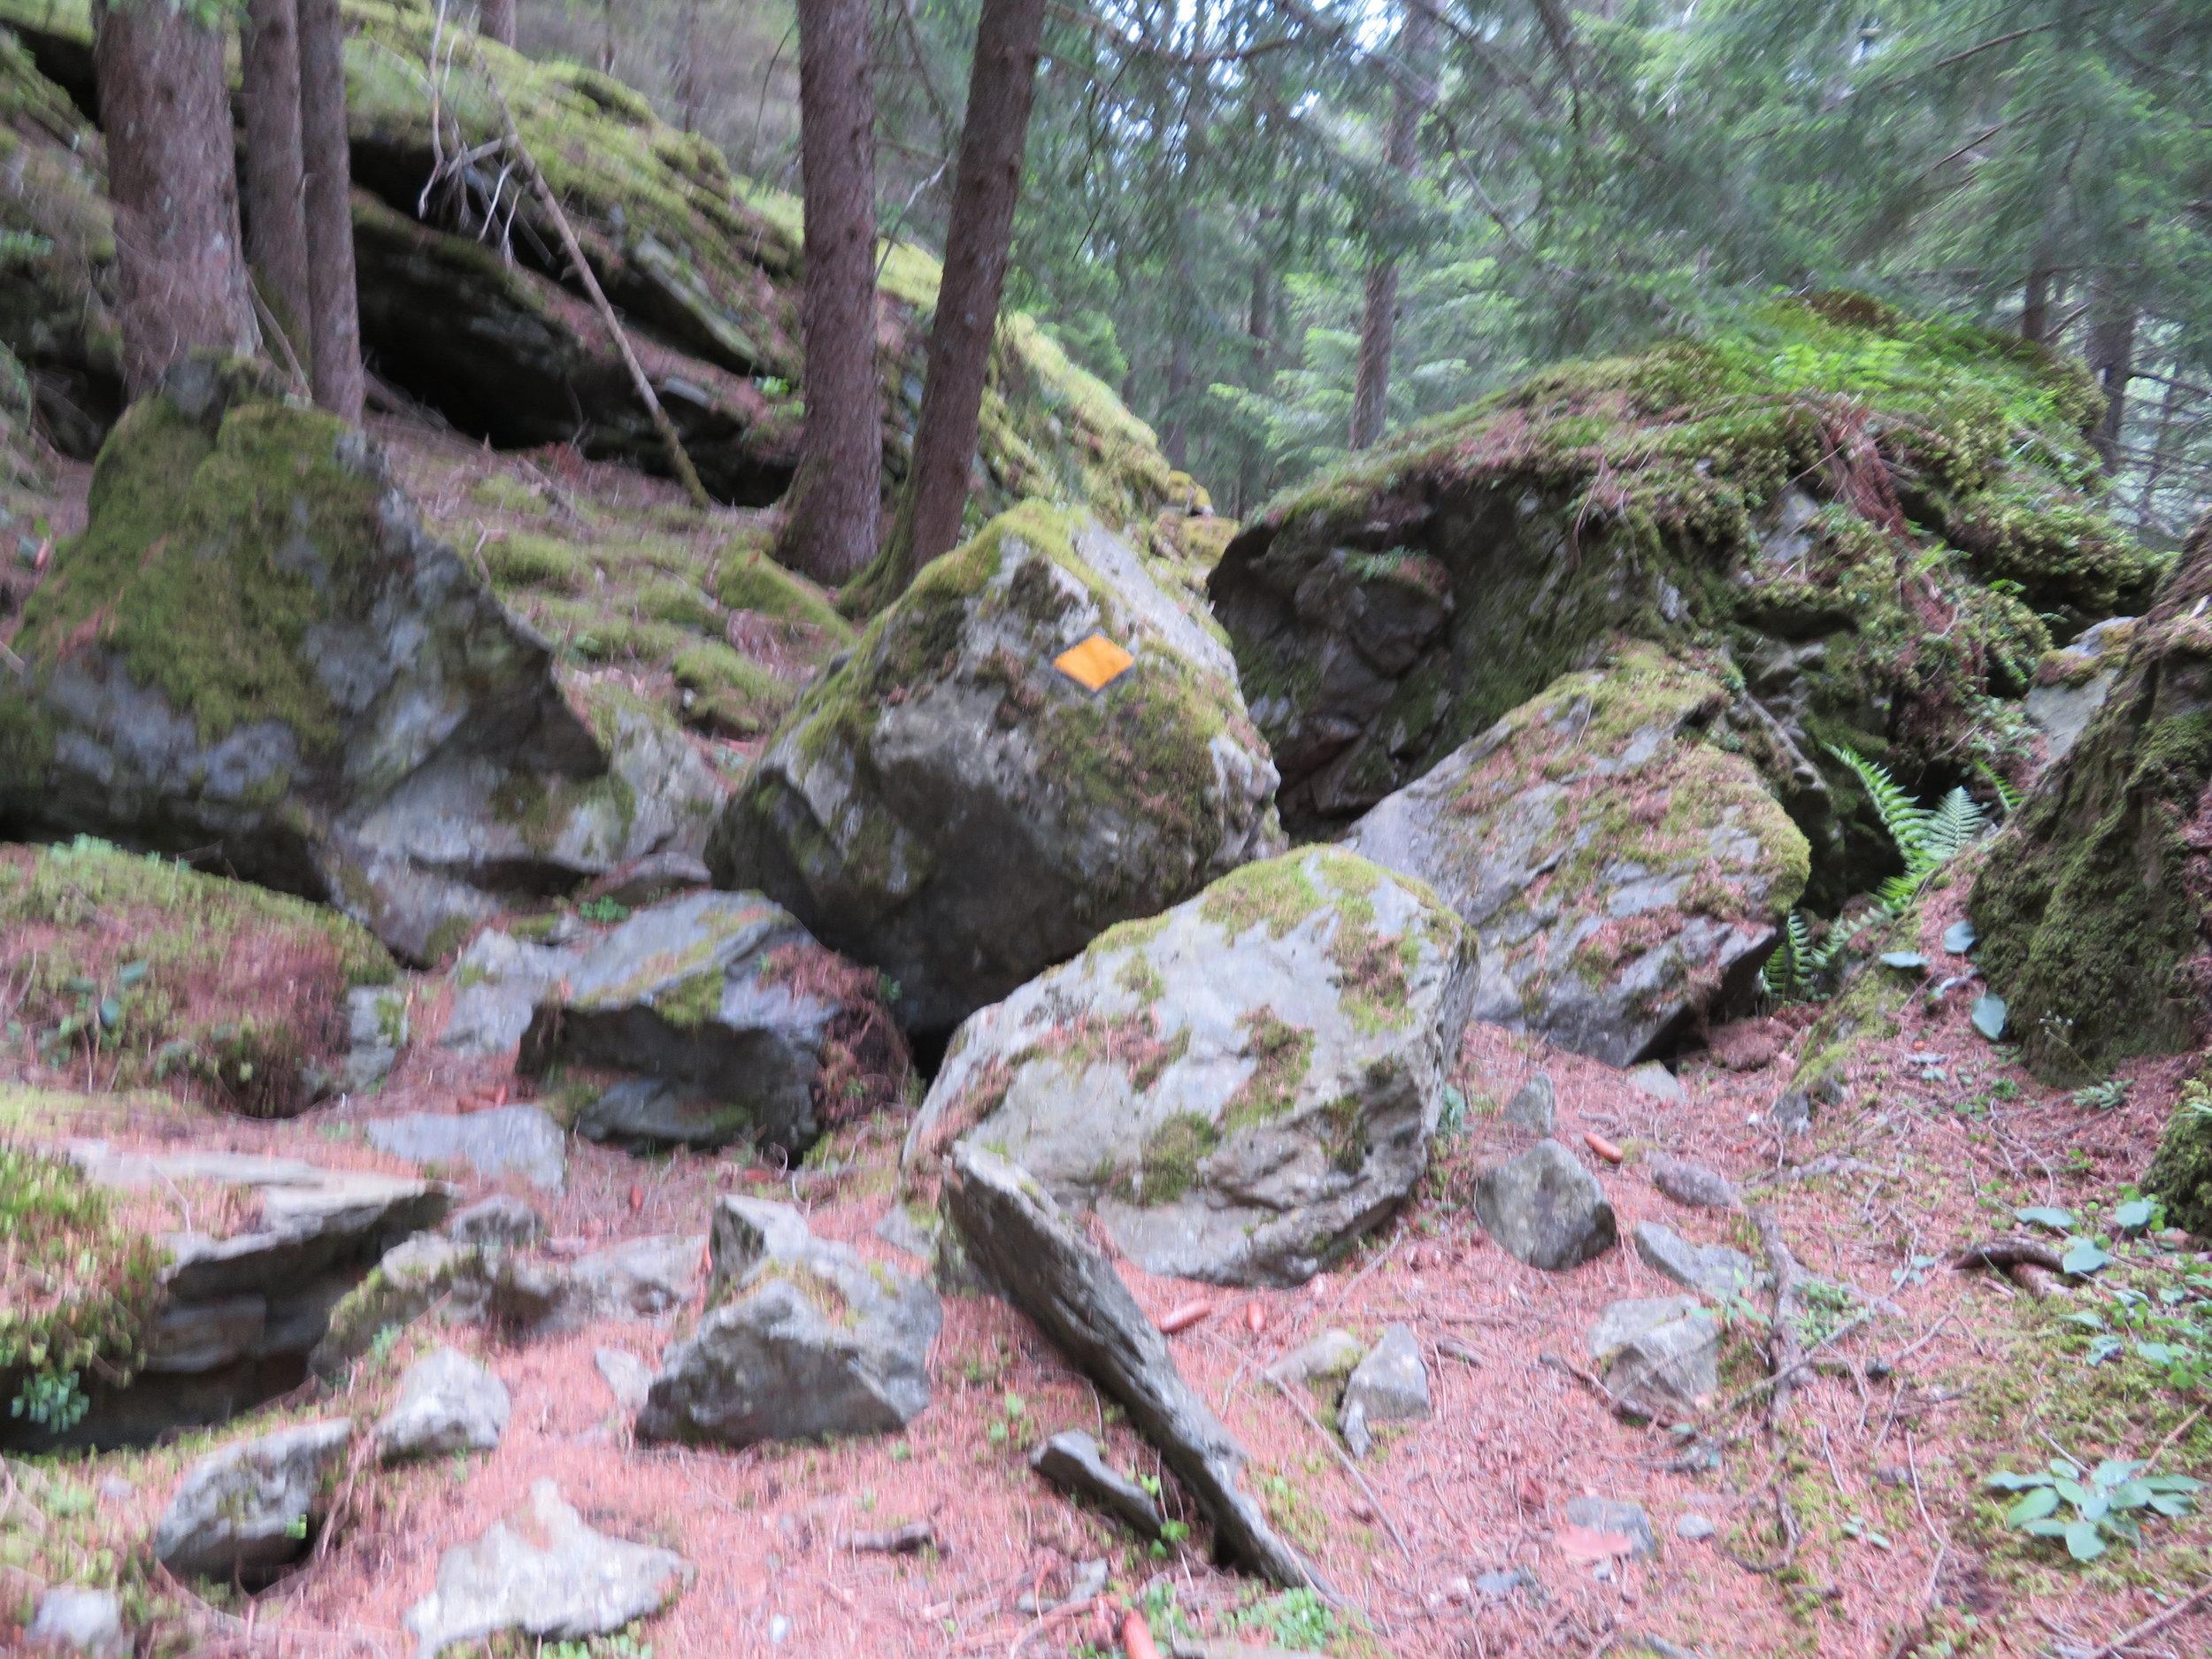 Huge boulders, ruts, roots and uenven terrain kept the walk very, very interesting.